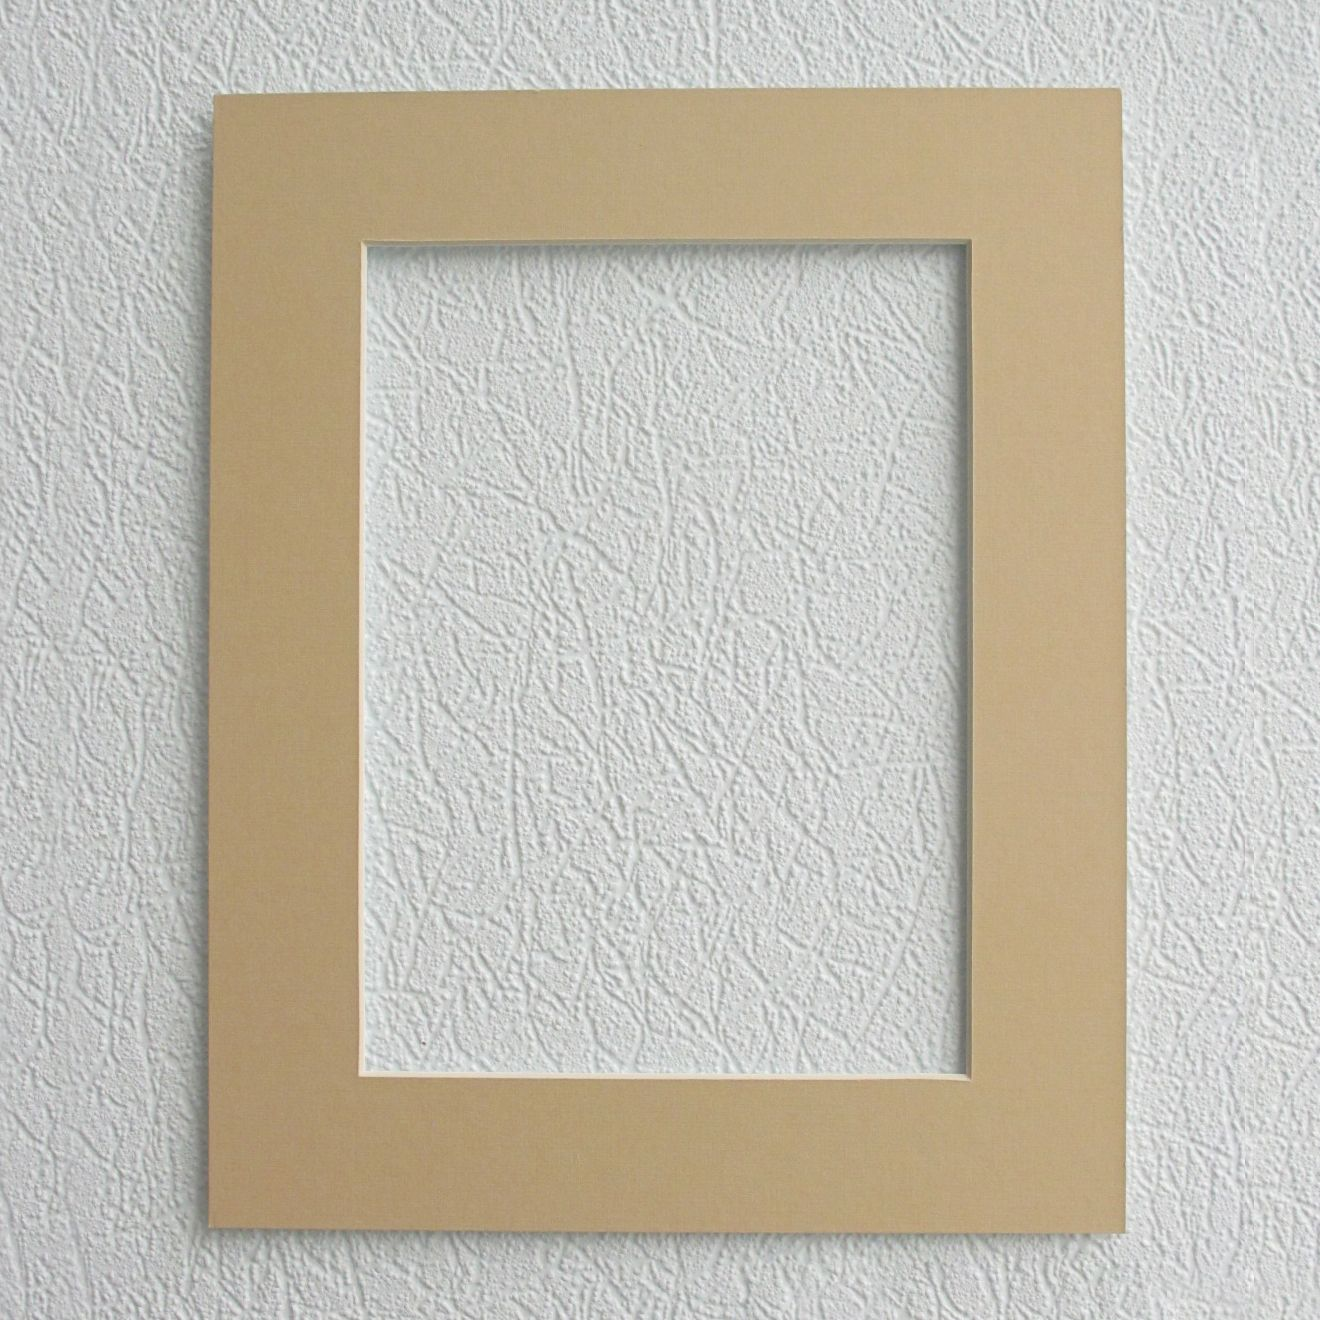 2407 Паспарту, 30*24 см (внутр. размер 21,5*15,7 см)